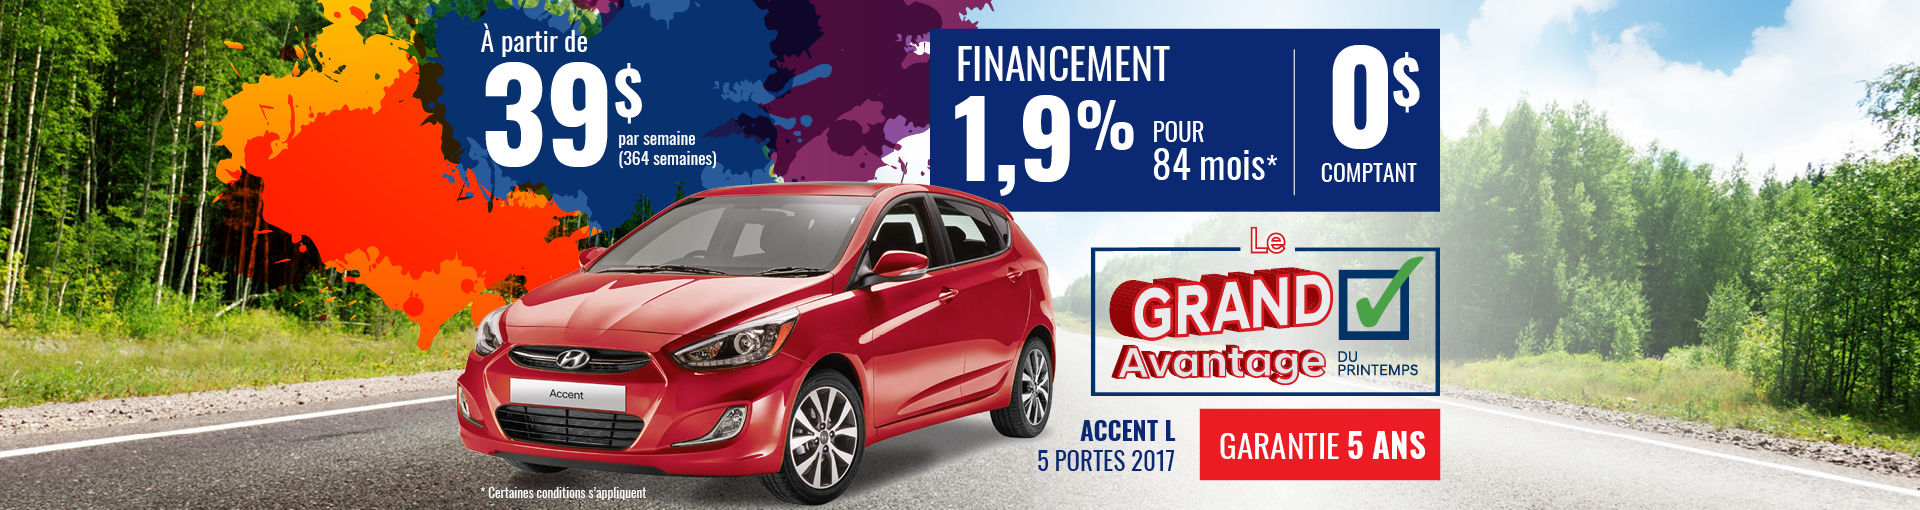 Promo Hyundai Casavant avril 2018-Accent L 2017 (Copie)